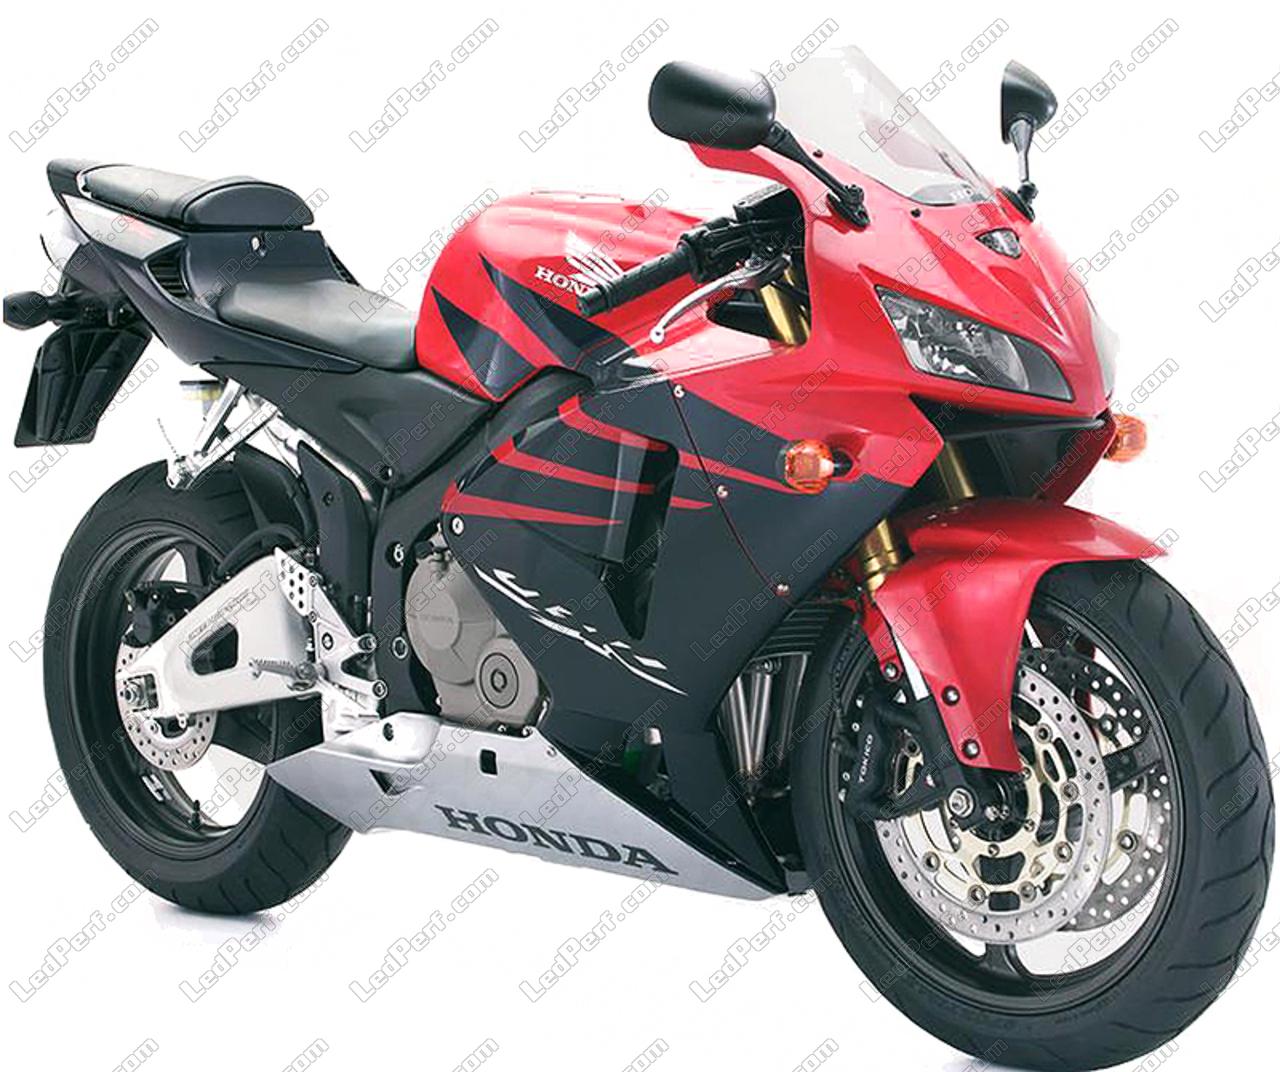 Additional Led Headlights For Motorcycle Honda Cbr 600 Rr 2005 2006 Long Range